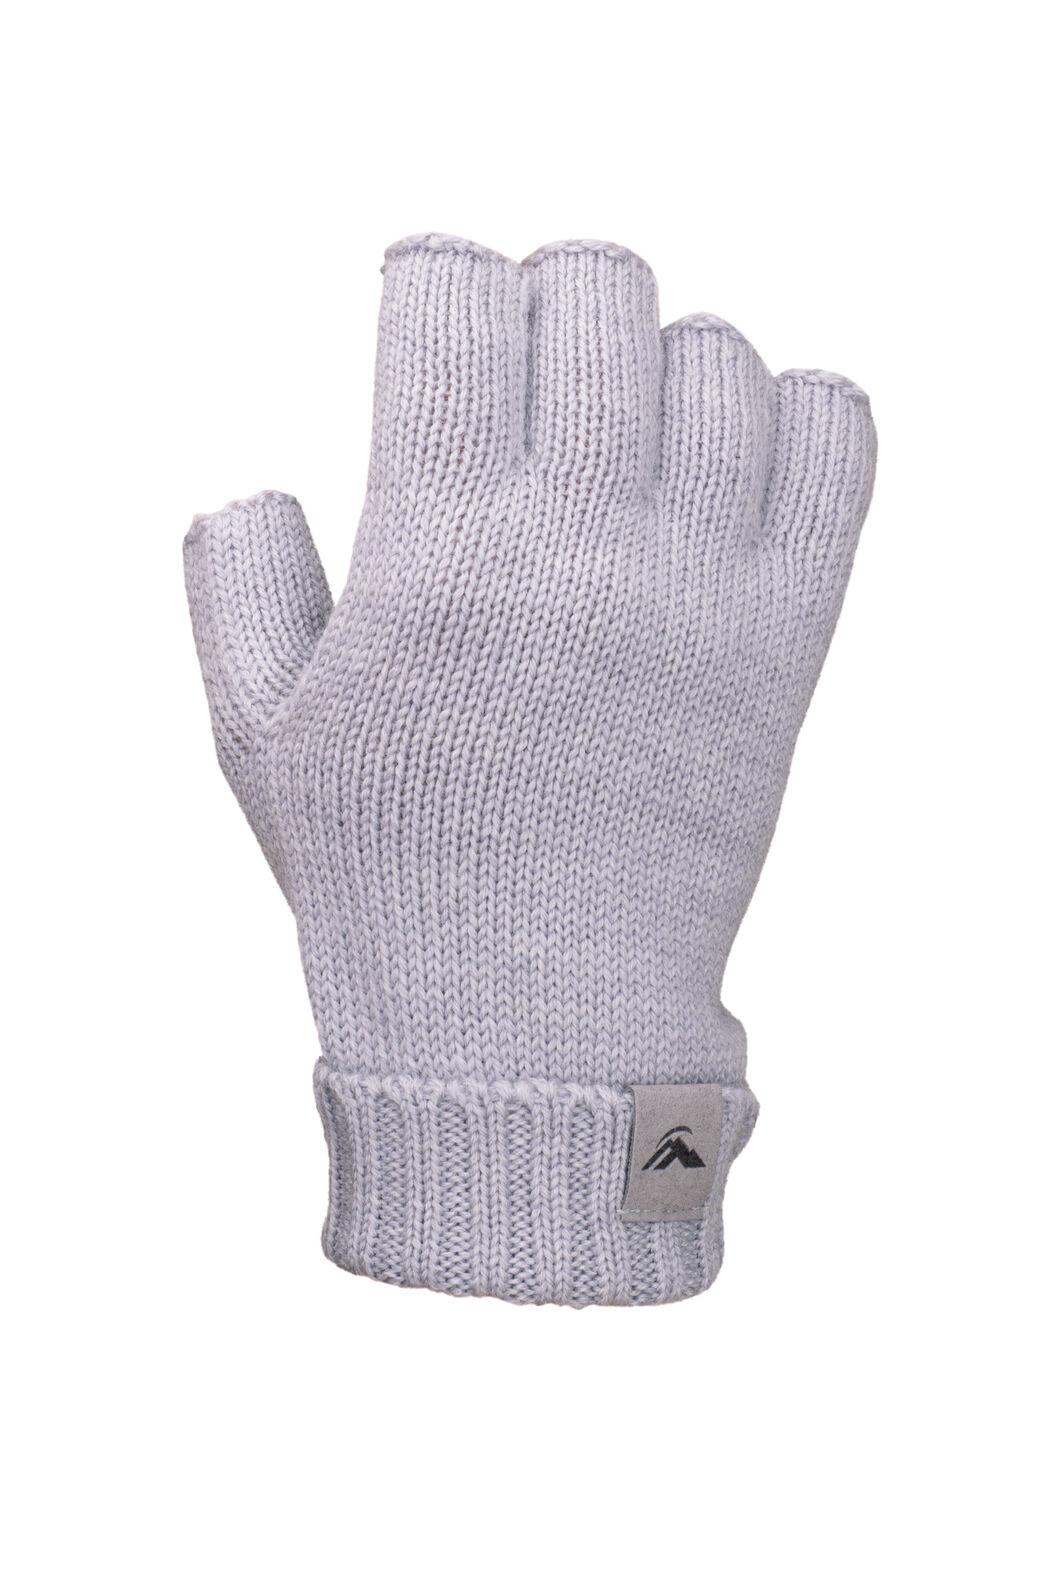 Macpac Merino Fingerless Gloves, LIGHT GREY, hi-res